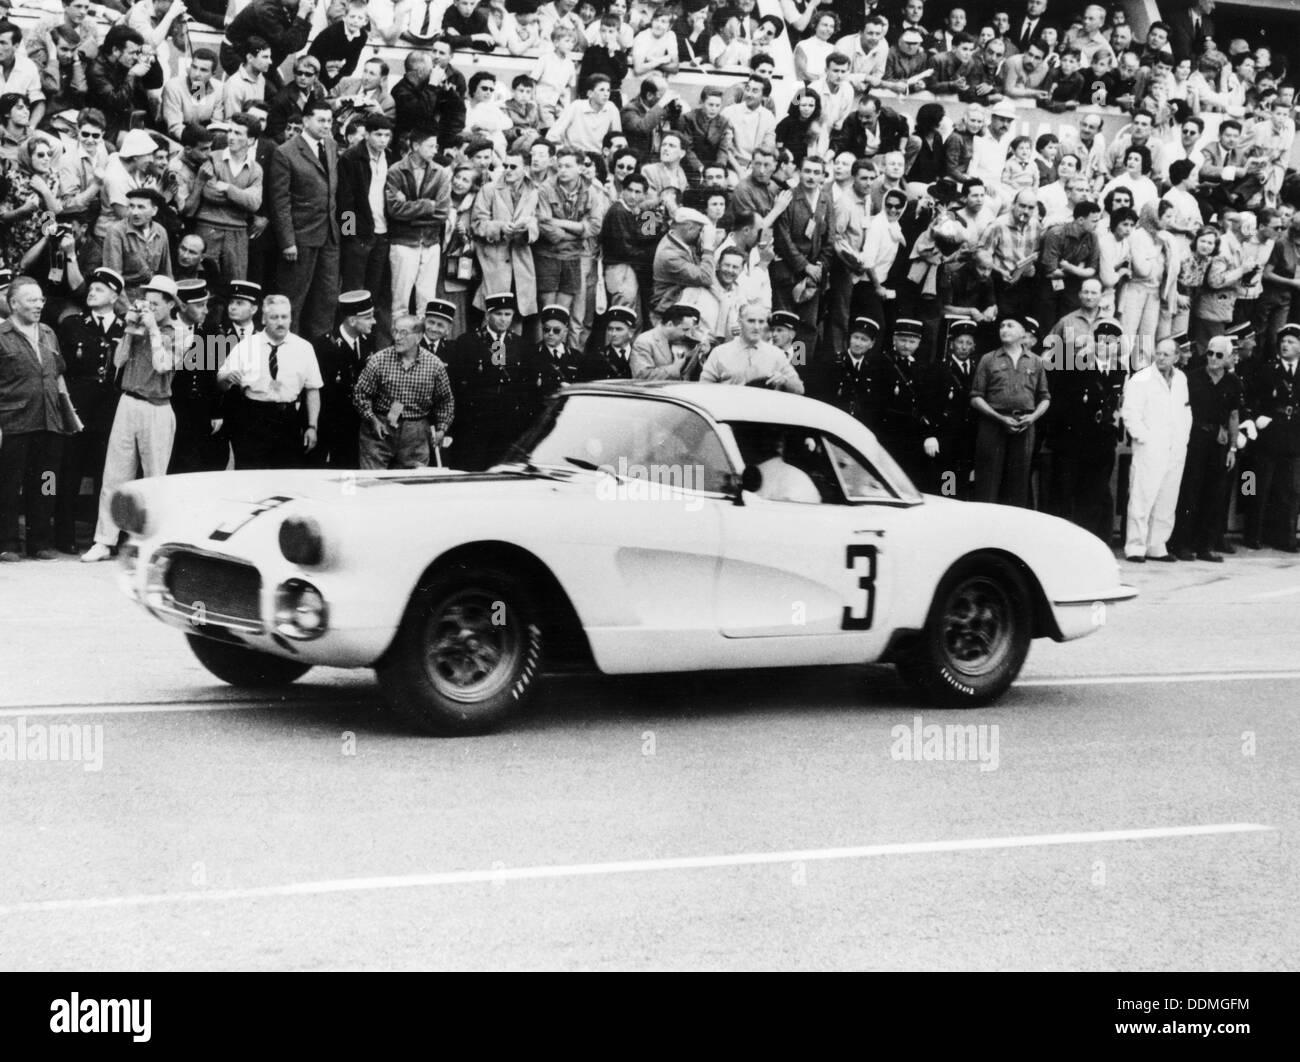 Chevrolet Corvette, Le Mans, France, 1960. - Stock Image